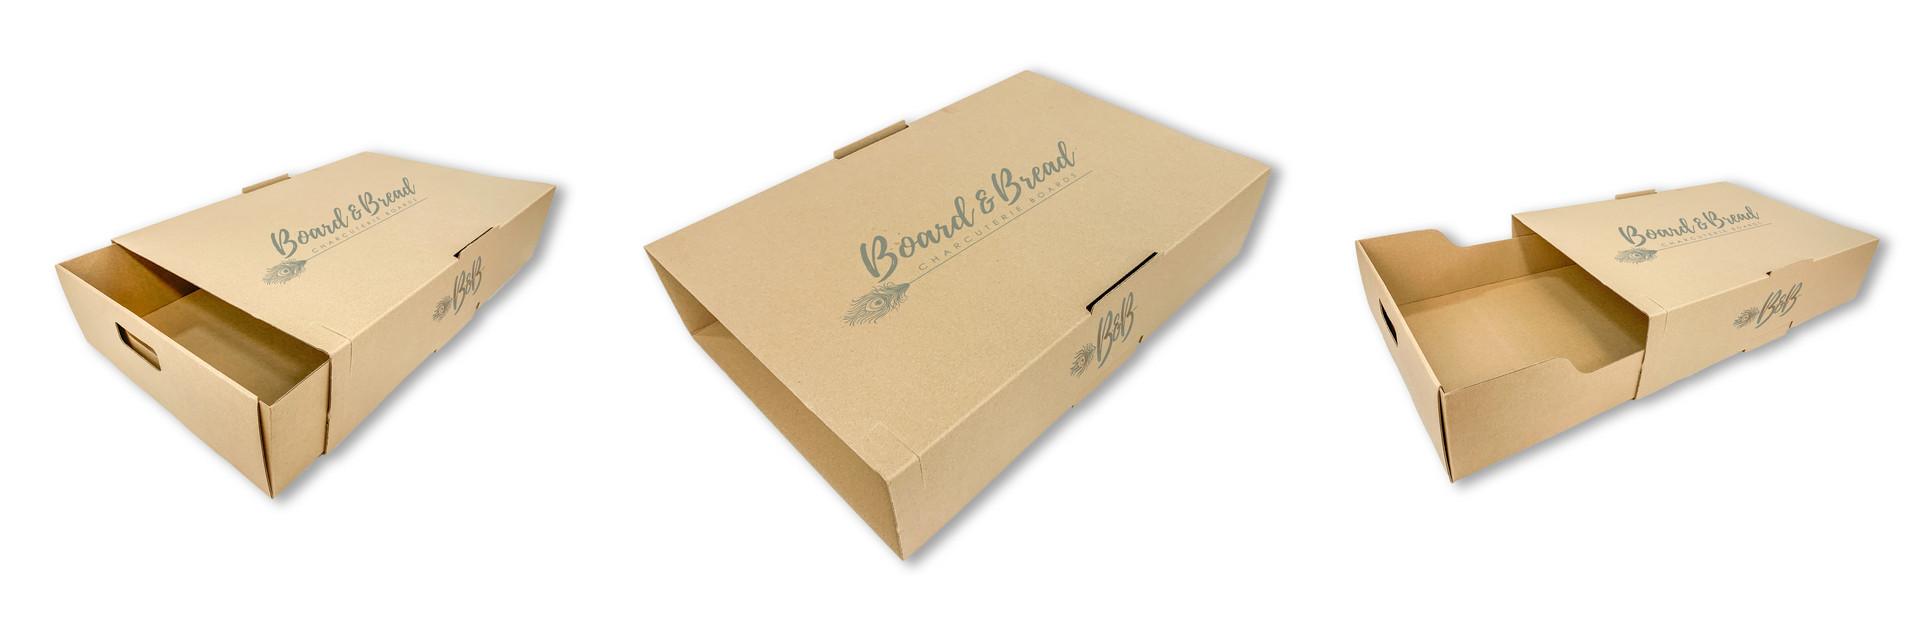 BRANDED CATERING BOX | BOARD & BREAD CHARCUTERIE